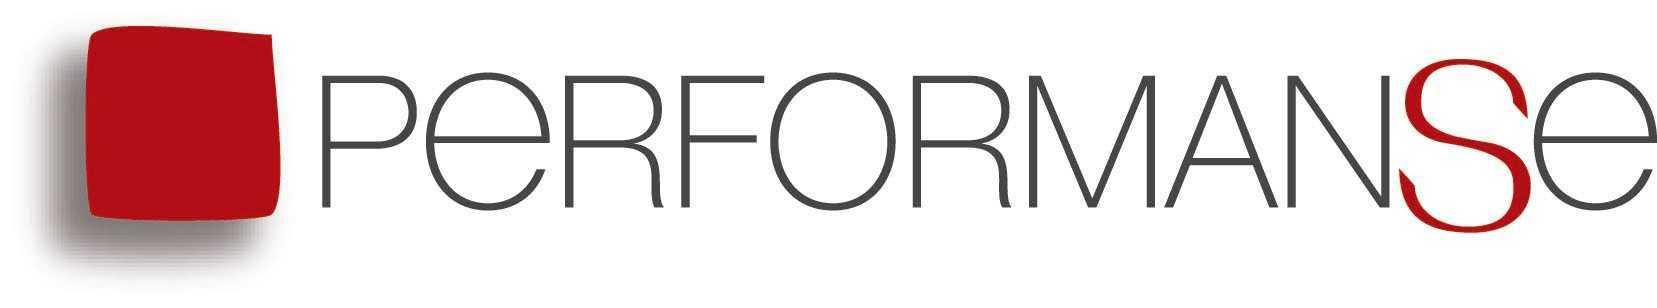 Logo PerformanSe